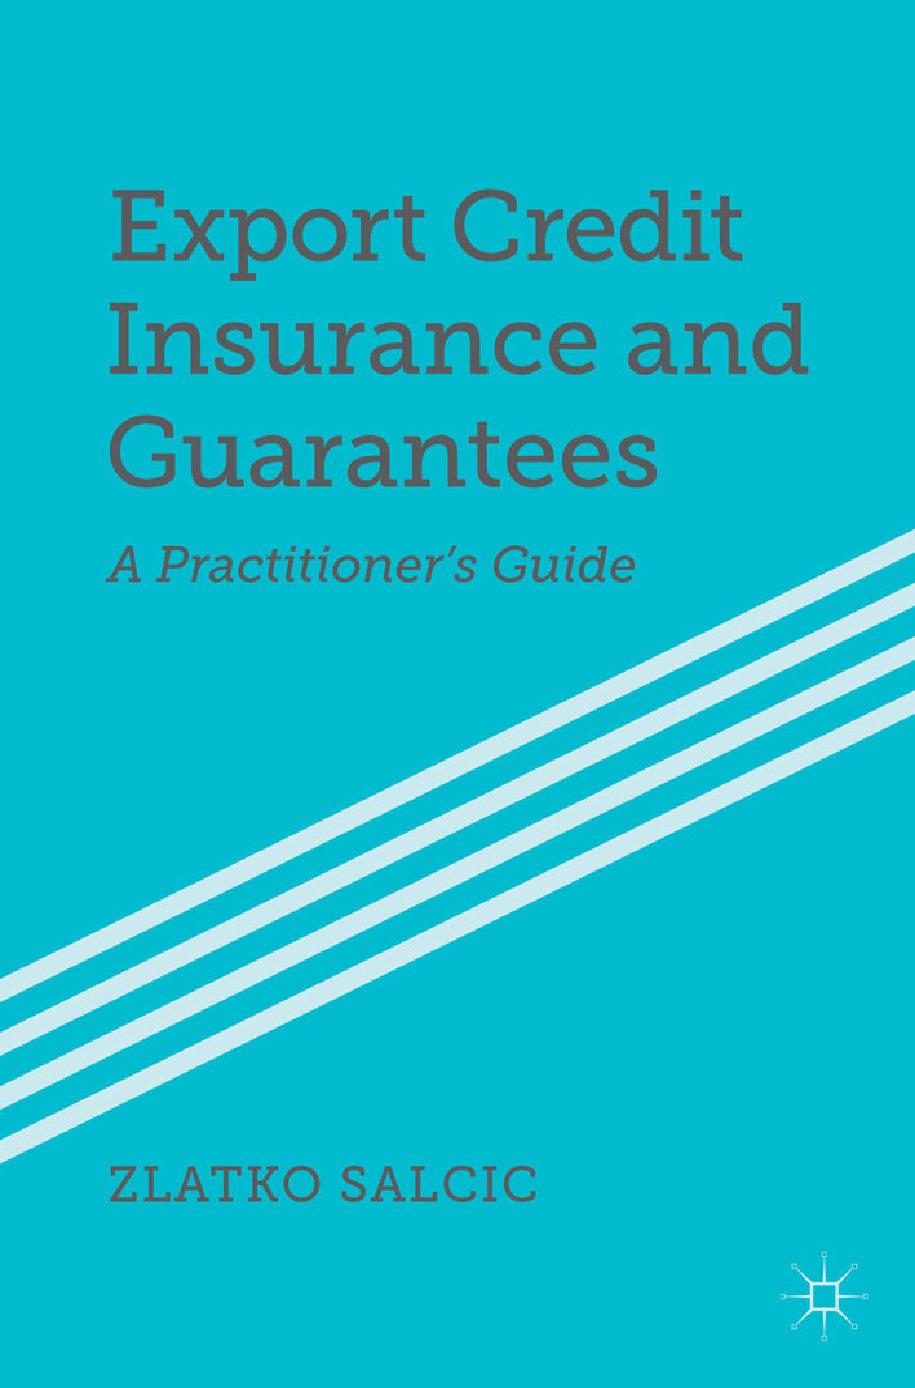 Salcic, Zlatko - Export Credit Insurance and Guarantees, ebook